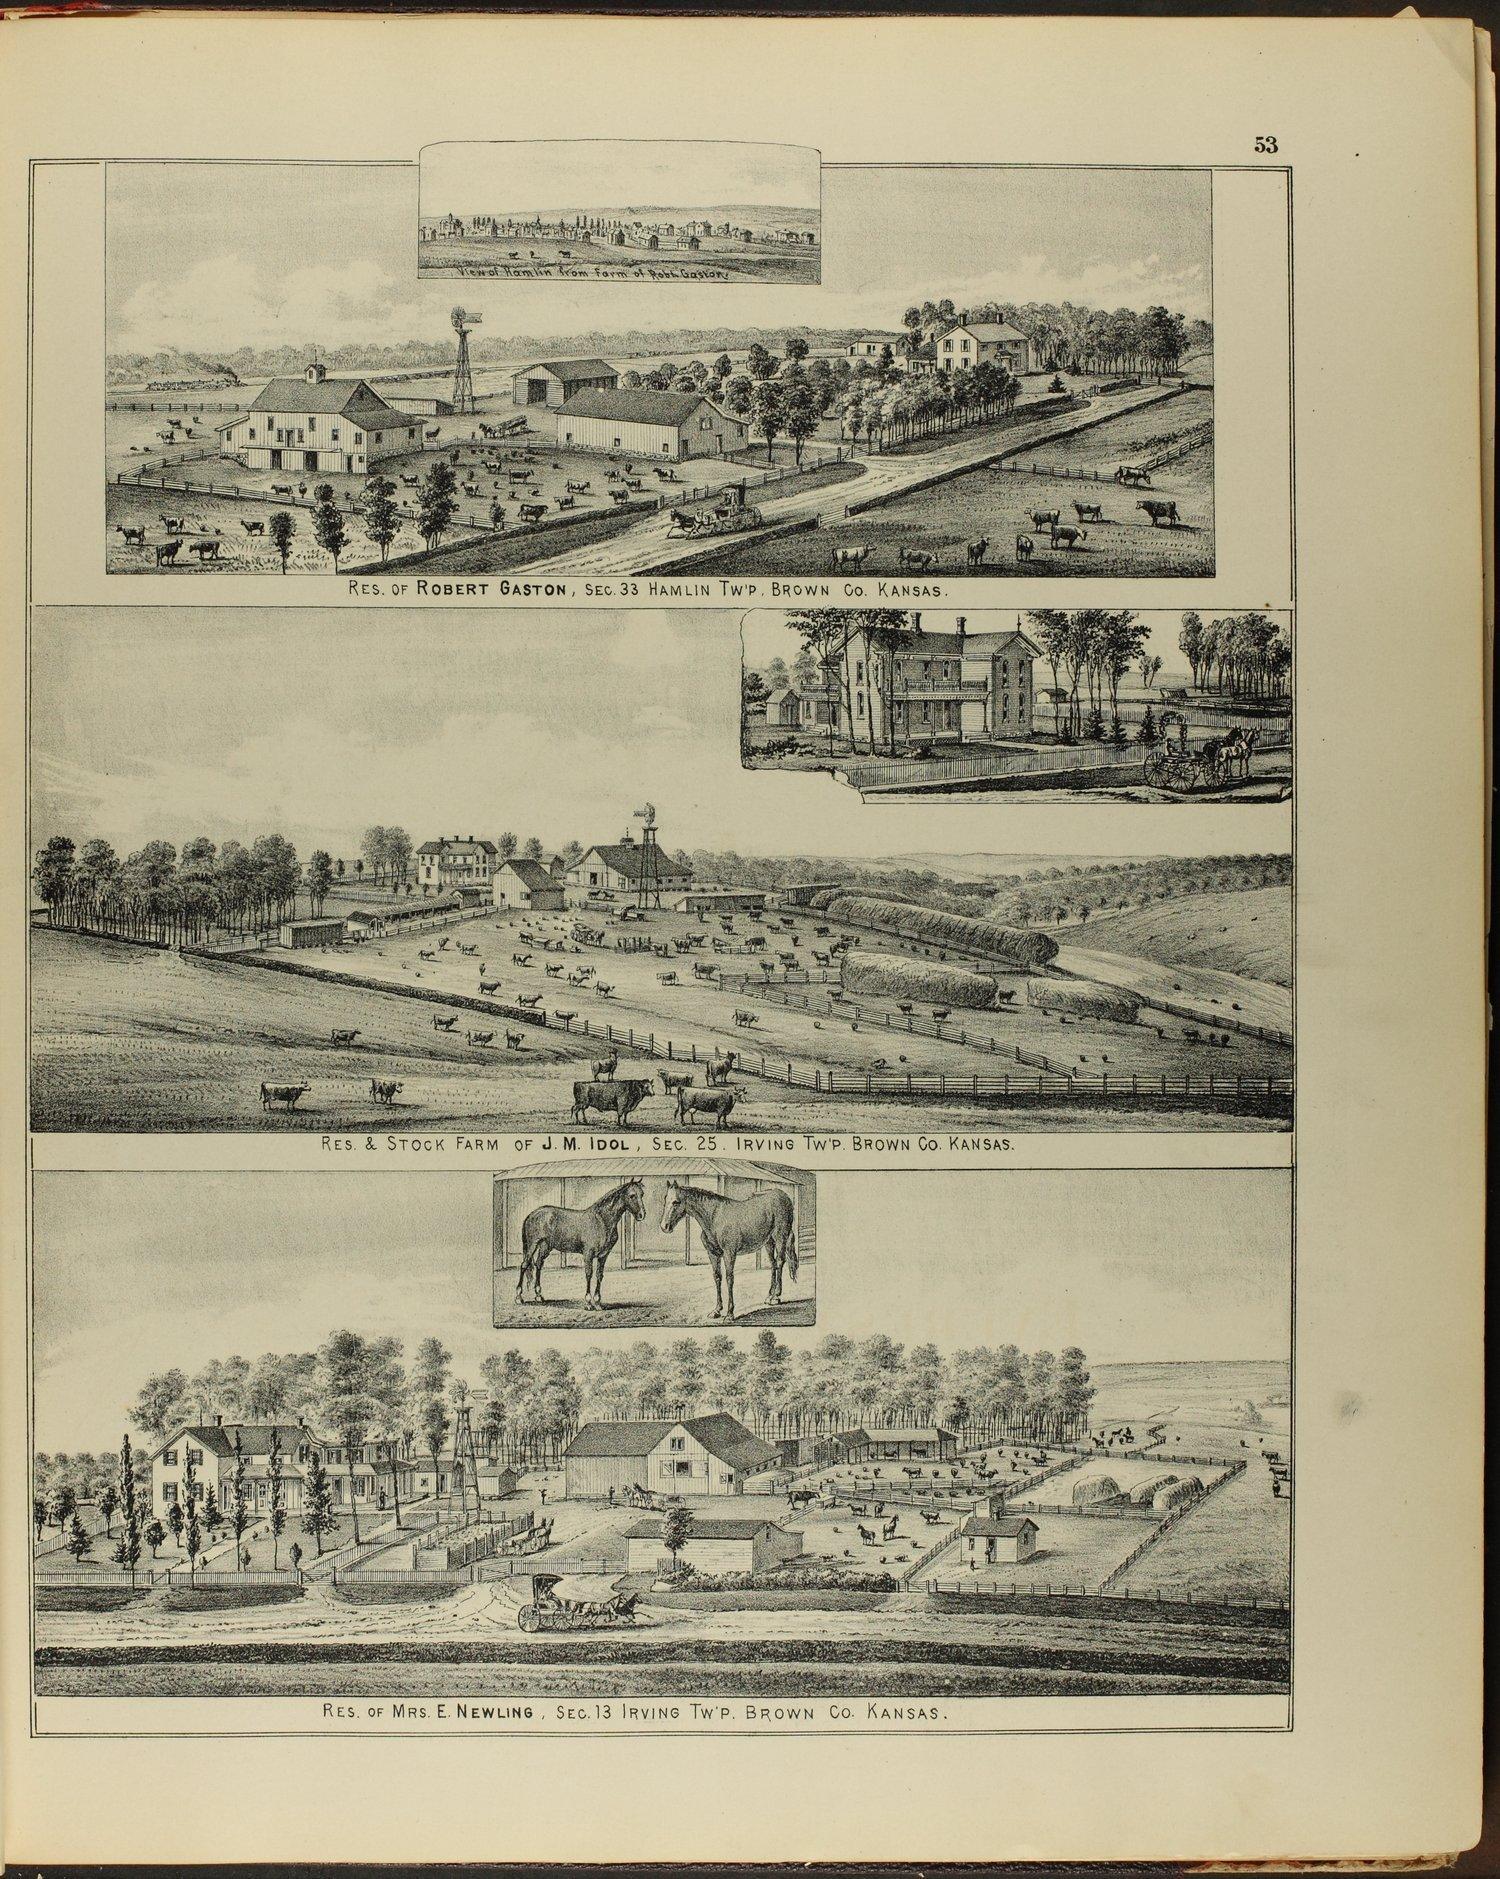 Meacham's illustrated atlas of Brown and Nemaha counties, Kansas - 53